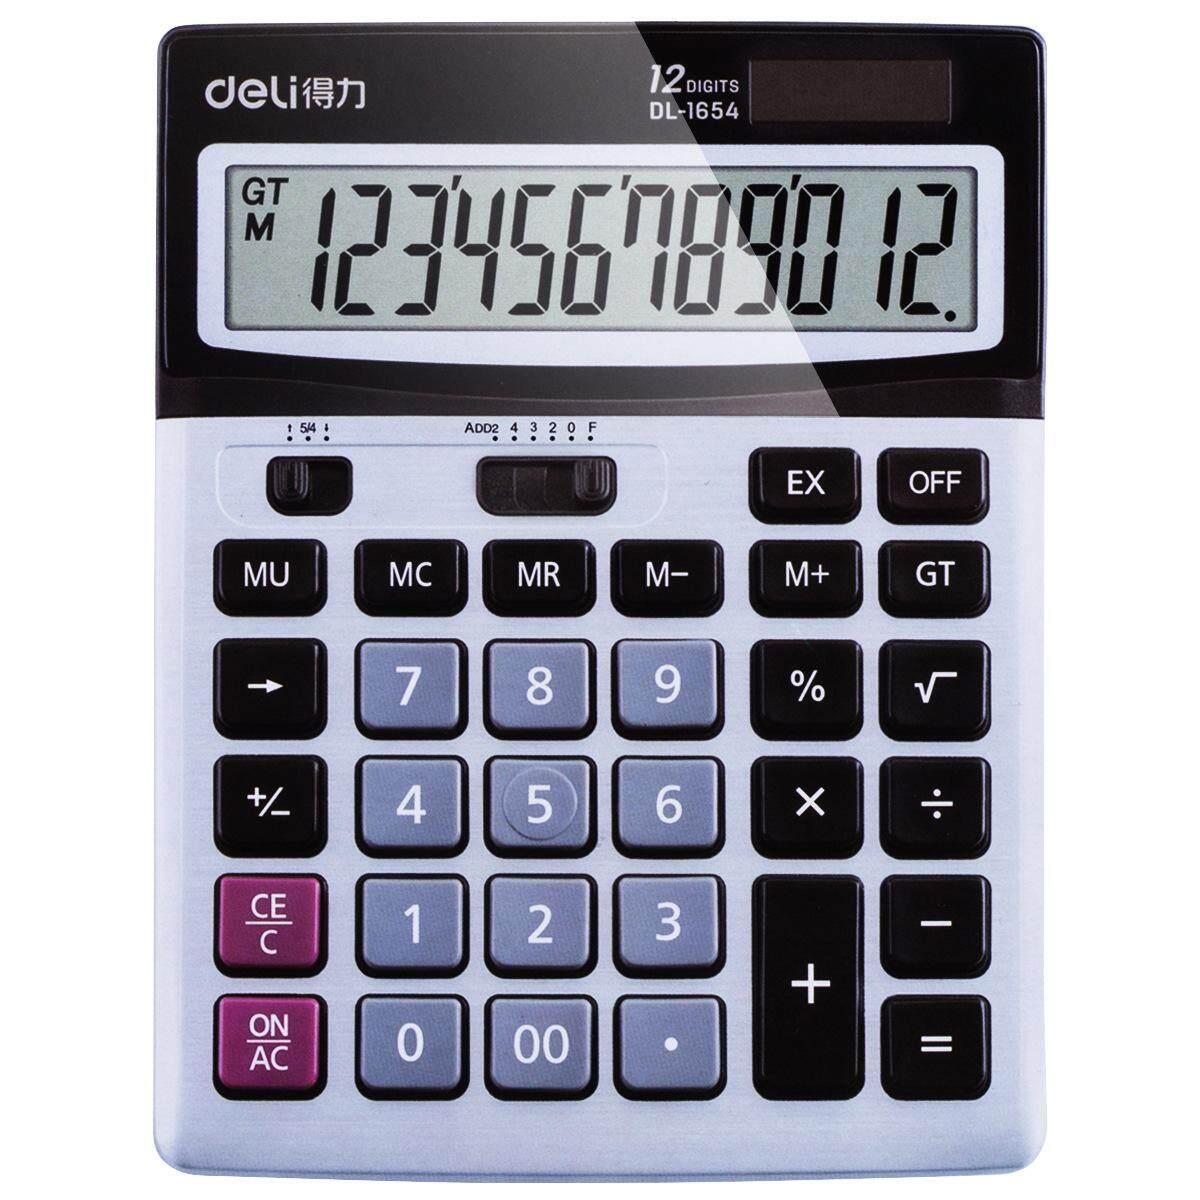 Promo Kalkulator Kasir Warung Toko Presicalc Pr3000 Update 2018 Dxracer Racing Series Oh Rv118nbw Zero Black White Buy Sell Cheapest Dc Best Quality Product Deals Roti Deli1654